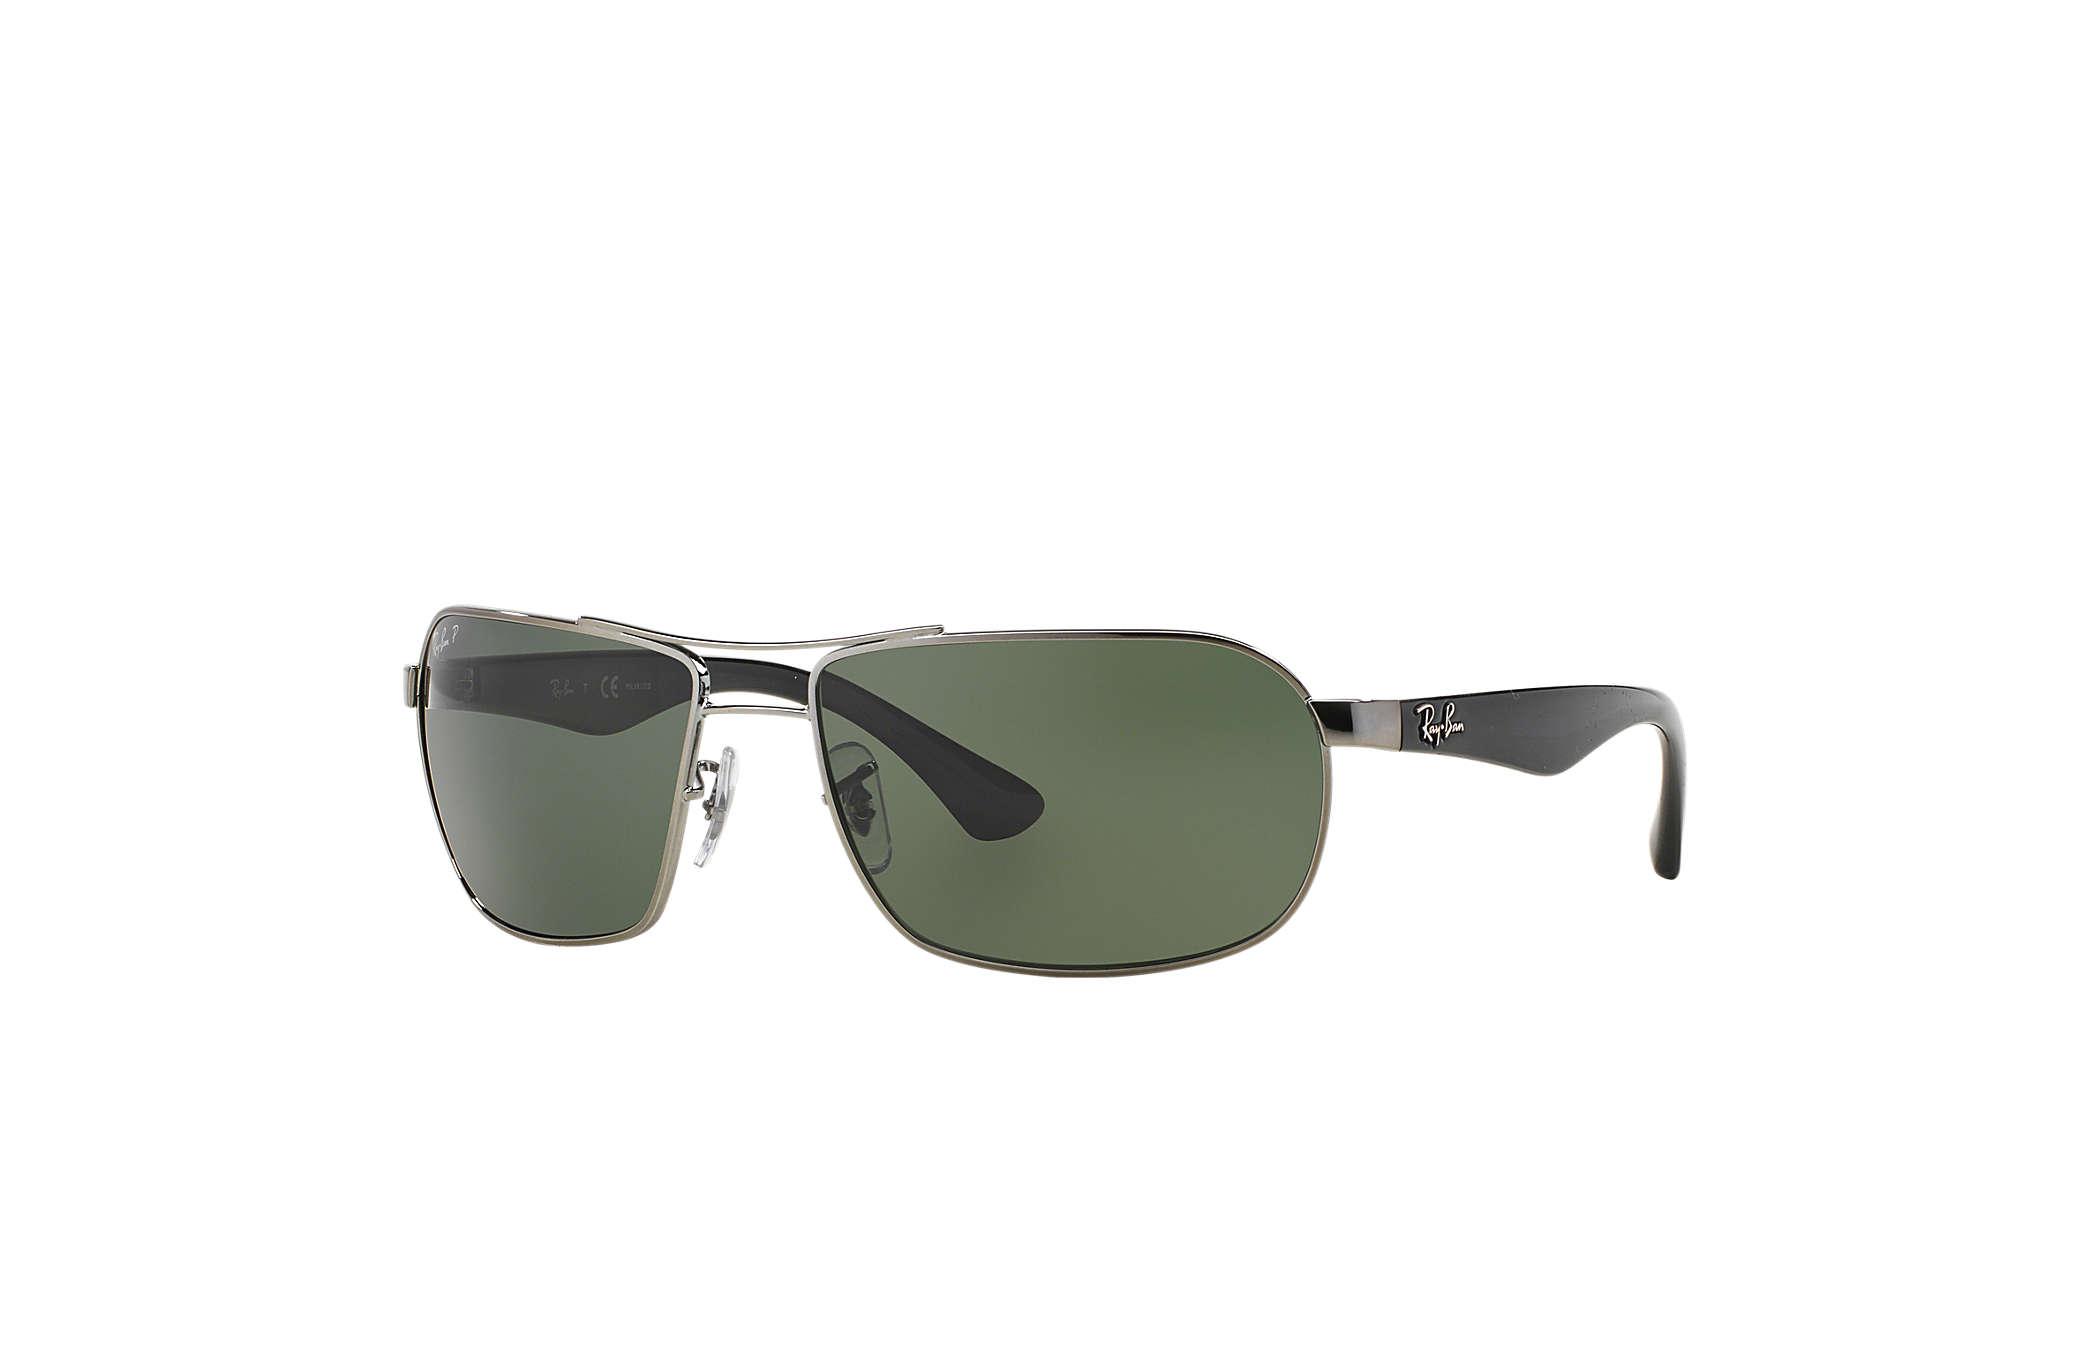 ray ban 3221  Ray-Ban RB3492 Gunmetal Black, Green Lenses